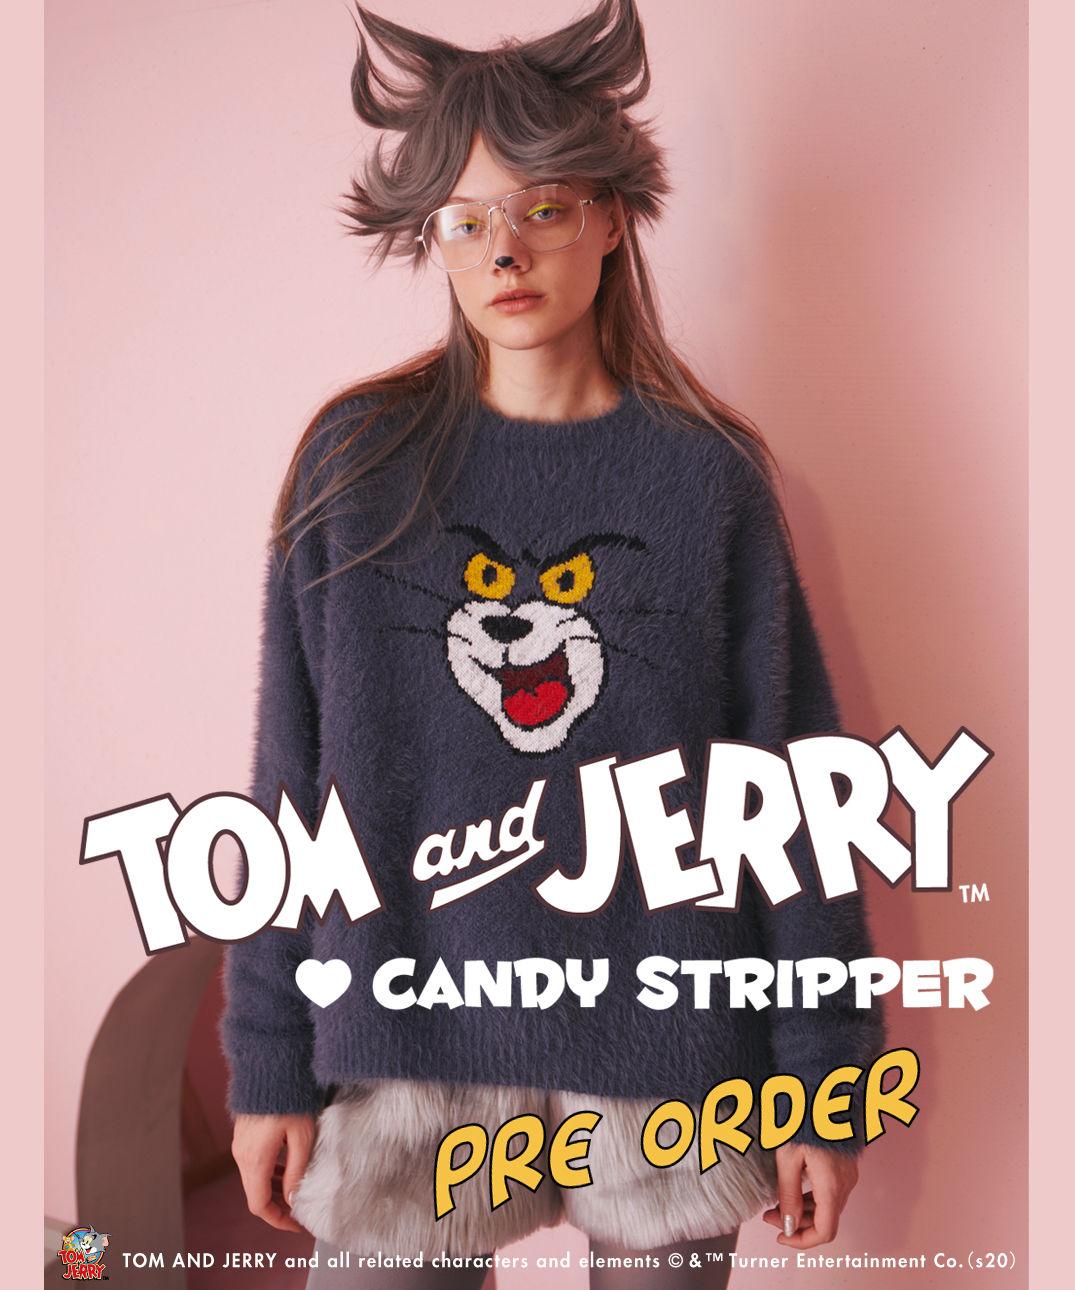 Candy Stripper(キャンディストリッパー )のショップニュース「【TOM and JERRY♡Candy Stripper】コラボアイテム予約開始♪」